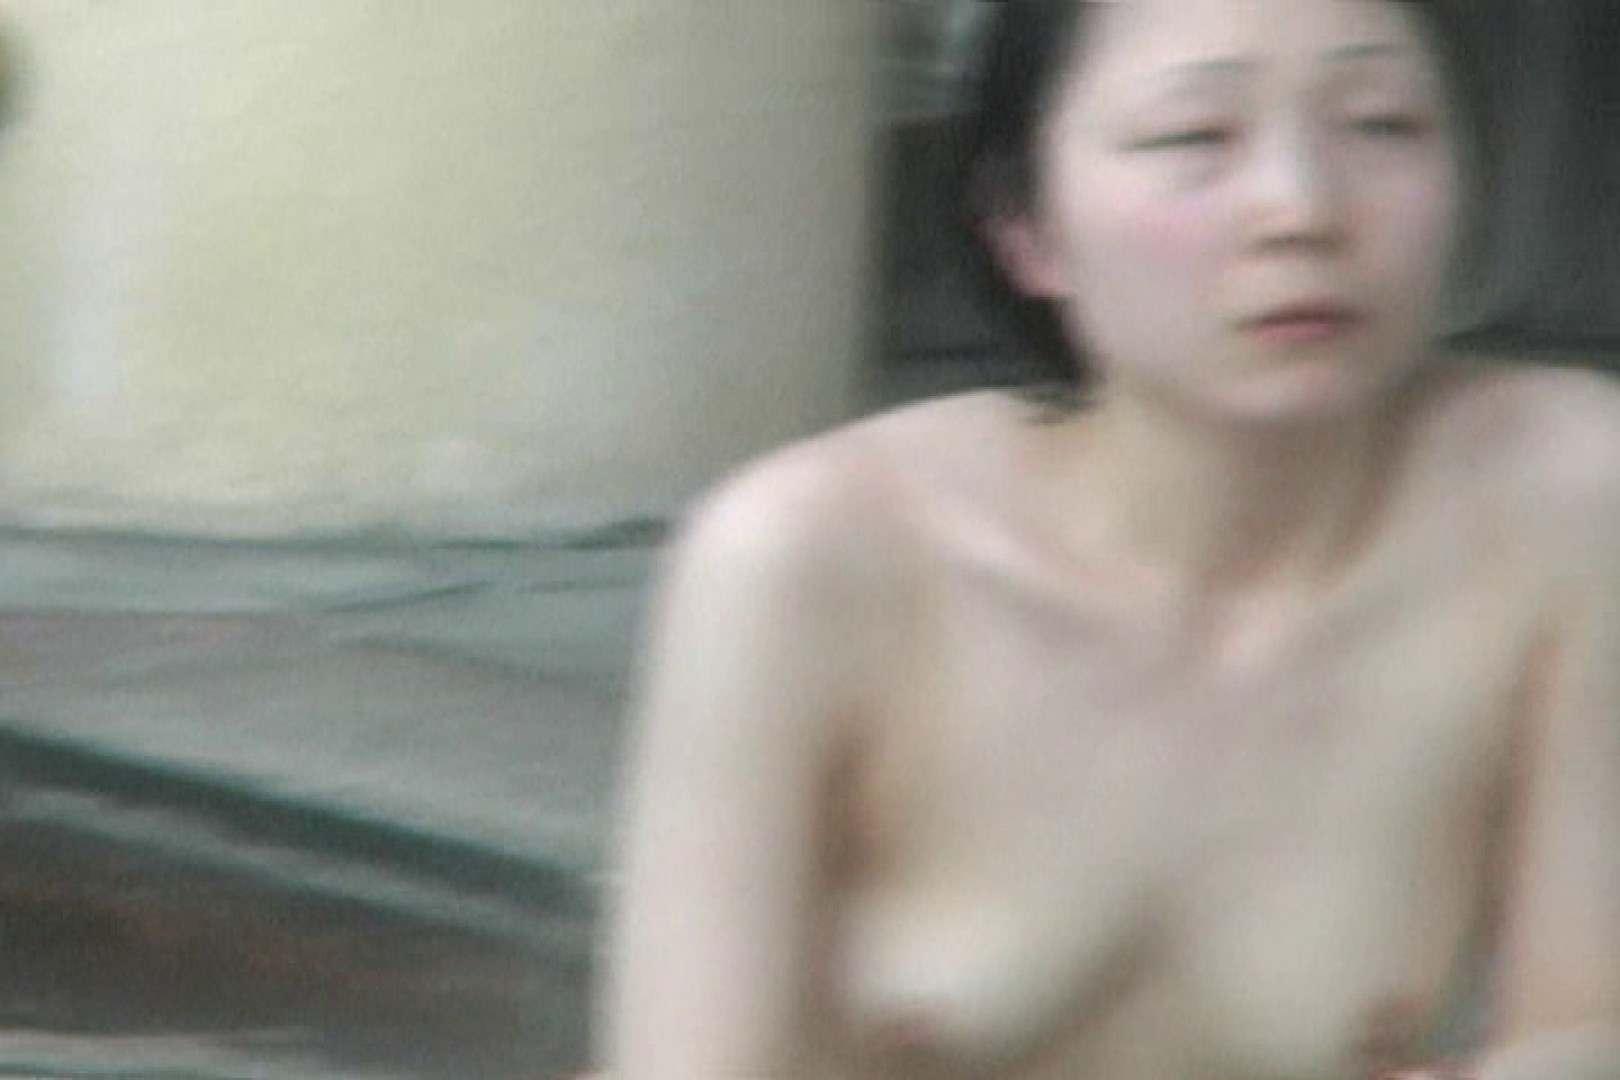 Aquaな露天風呂Vol.596 盗撮シリーズ | 露天風呂編  113PIX 85